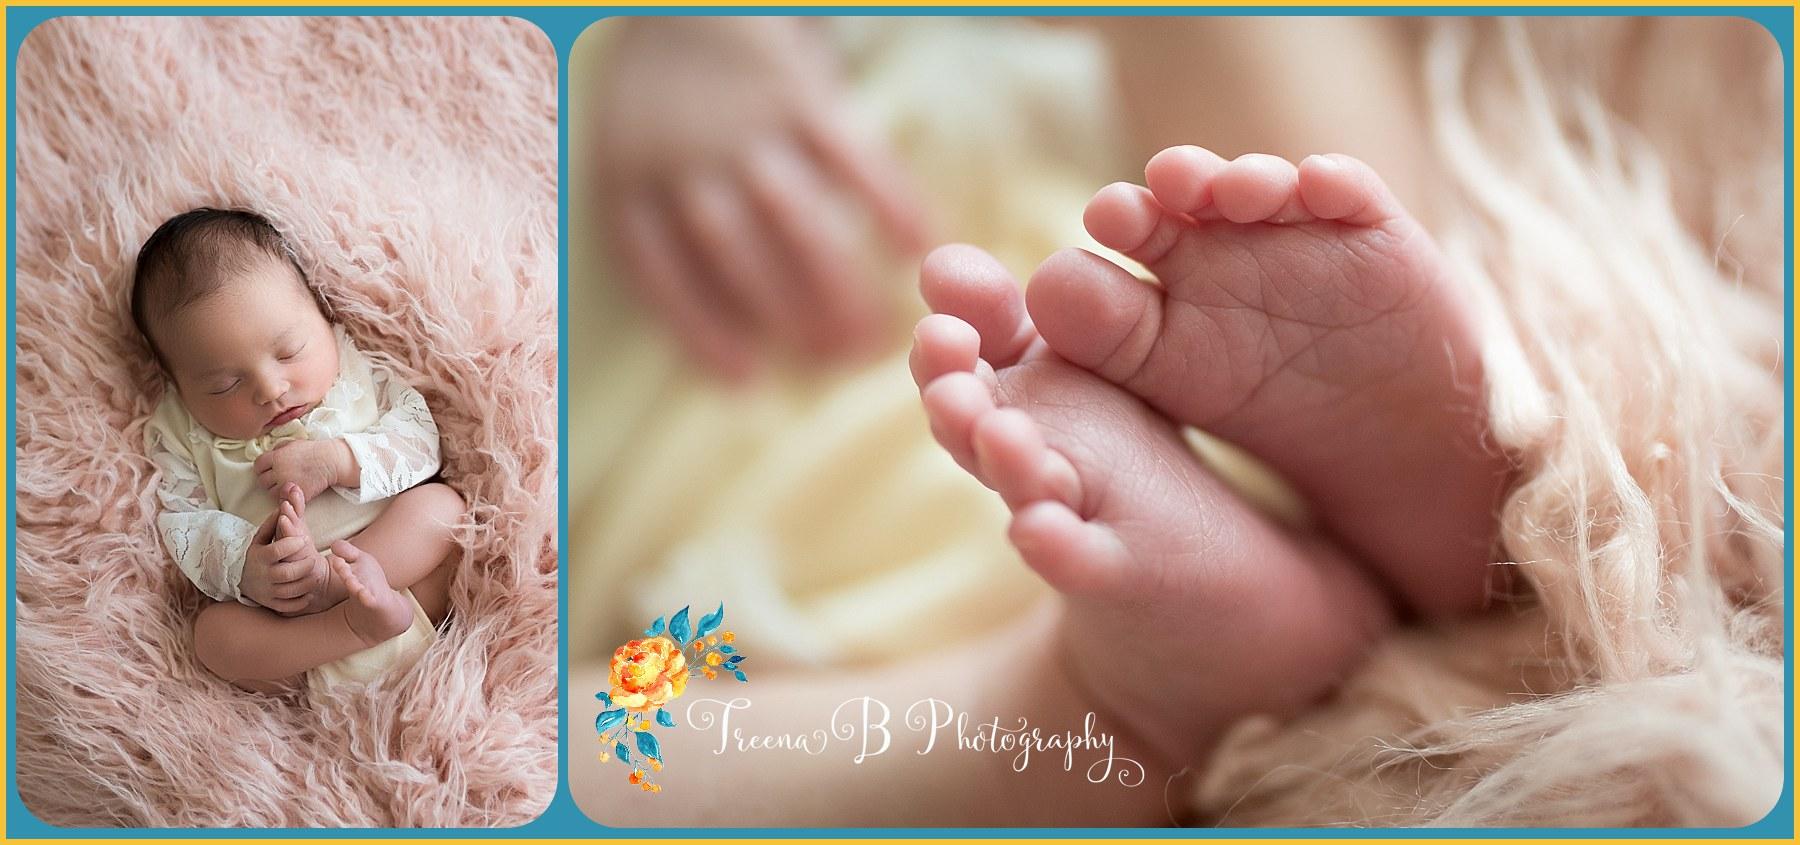 Treena B Photography Newborn Portrait Session September 2017